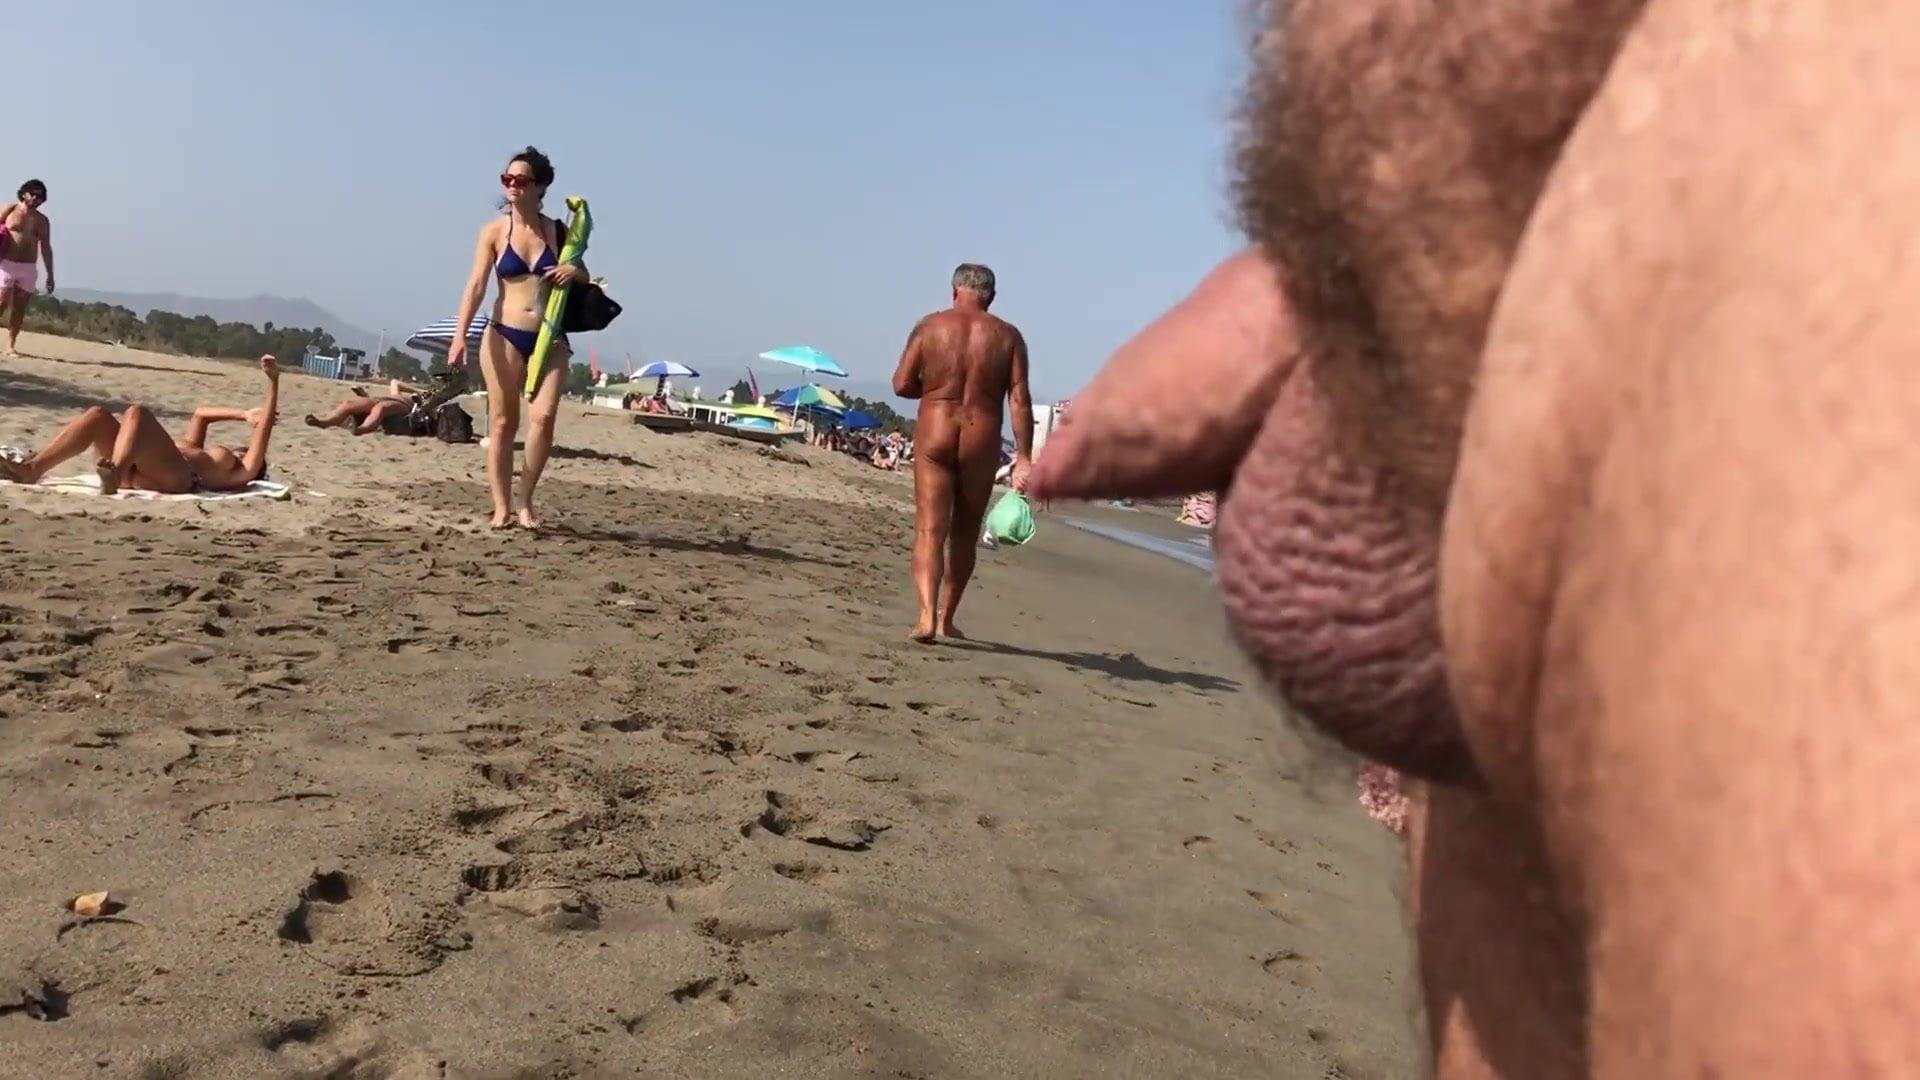 Beach Public Sex Watching